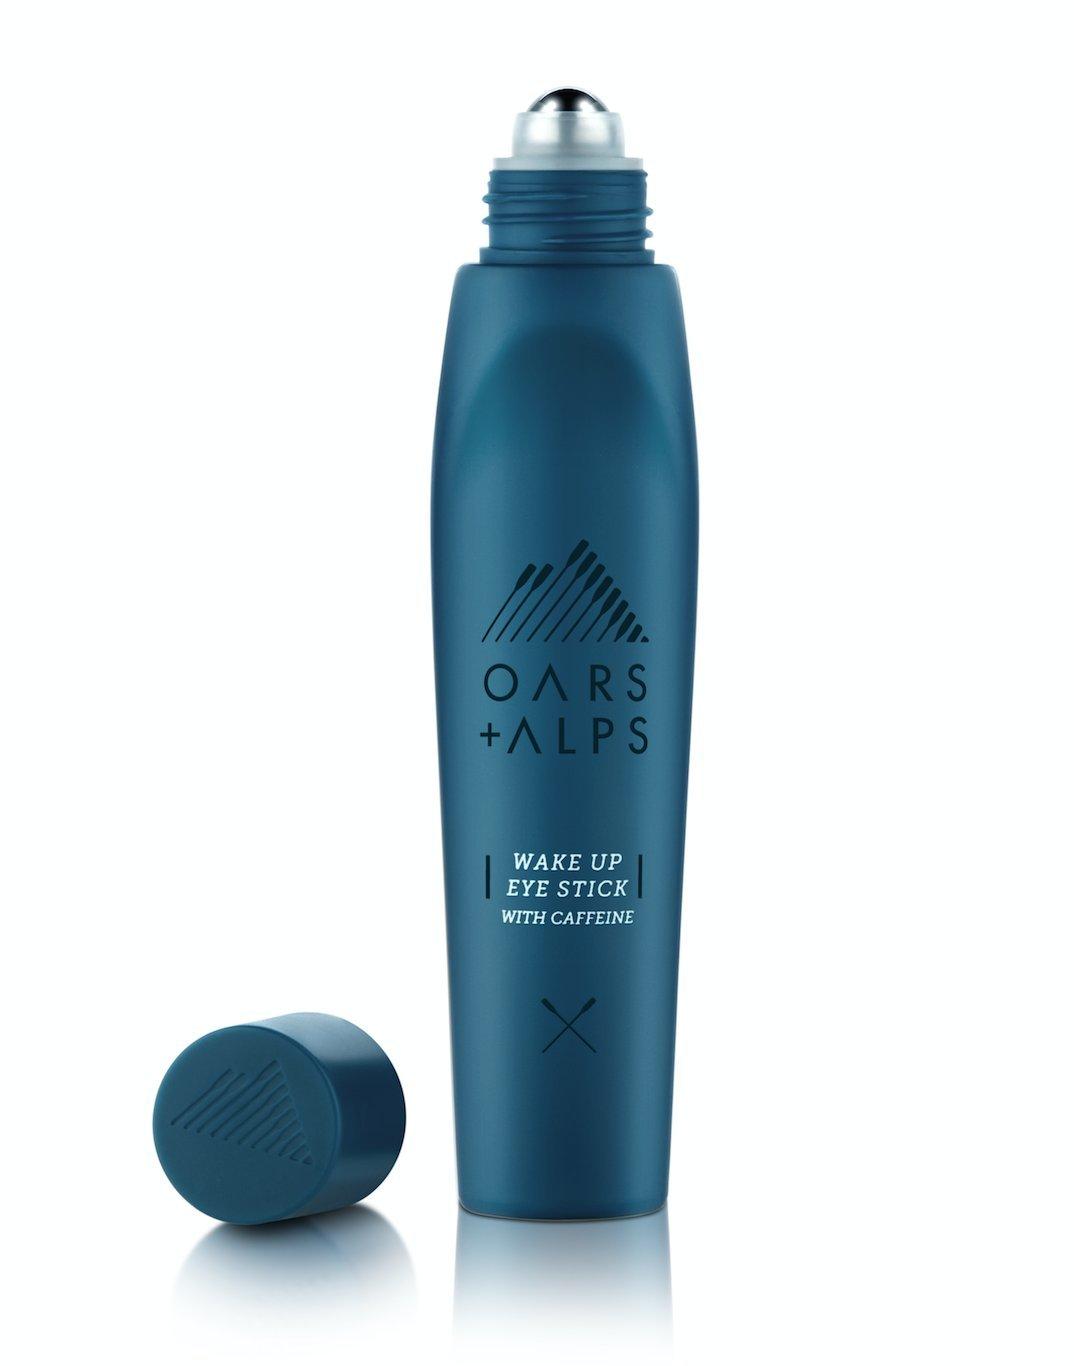 Oars + Alps Wake Up Eye Stick, 0.5 oz.